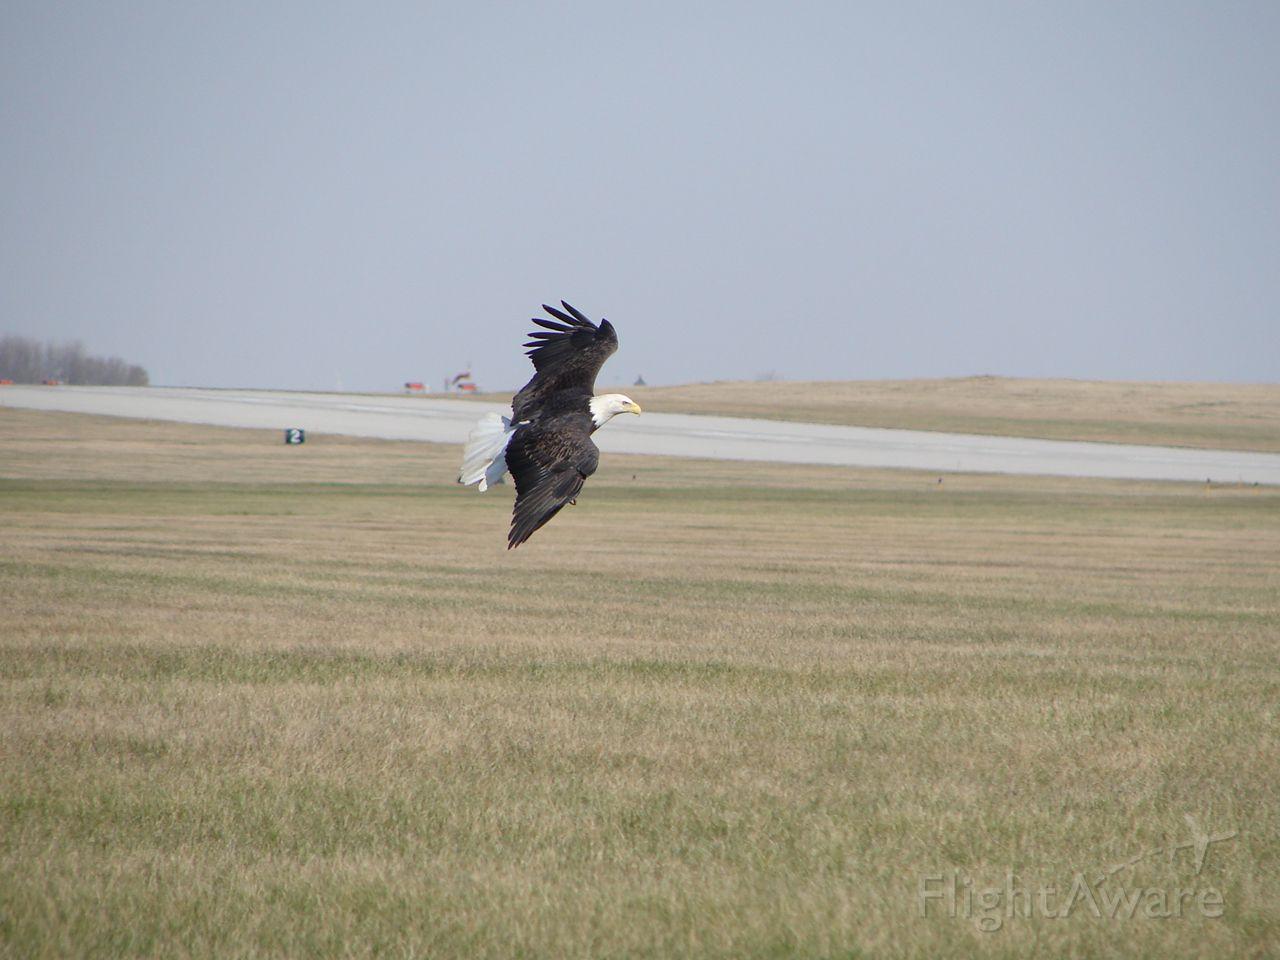 — — - Bald eagle soaring at MCW